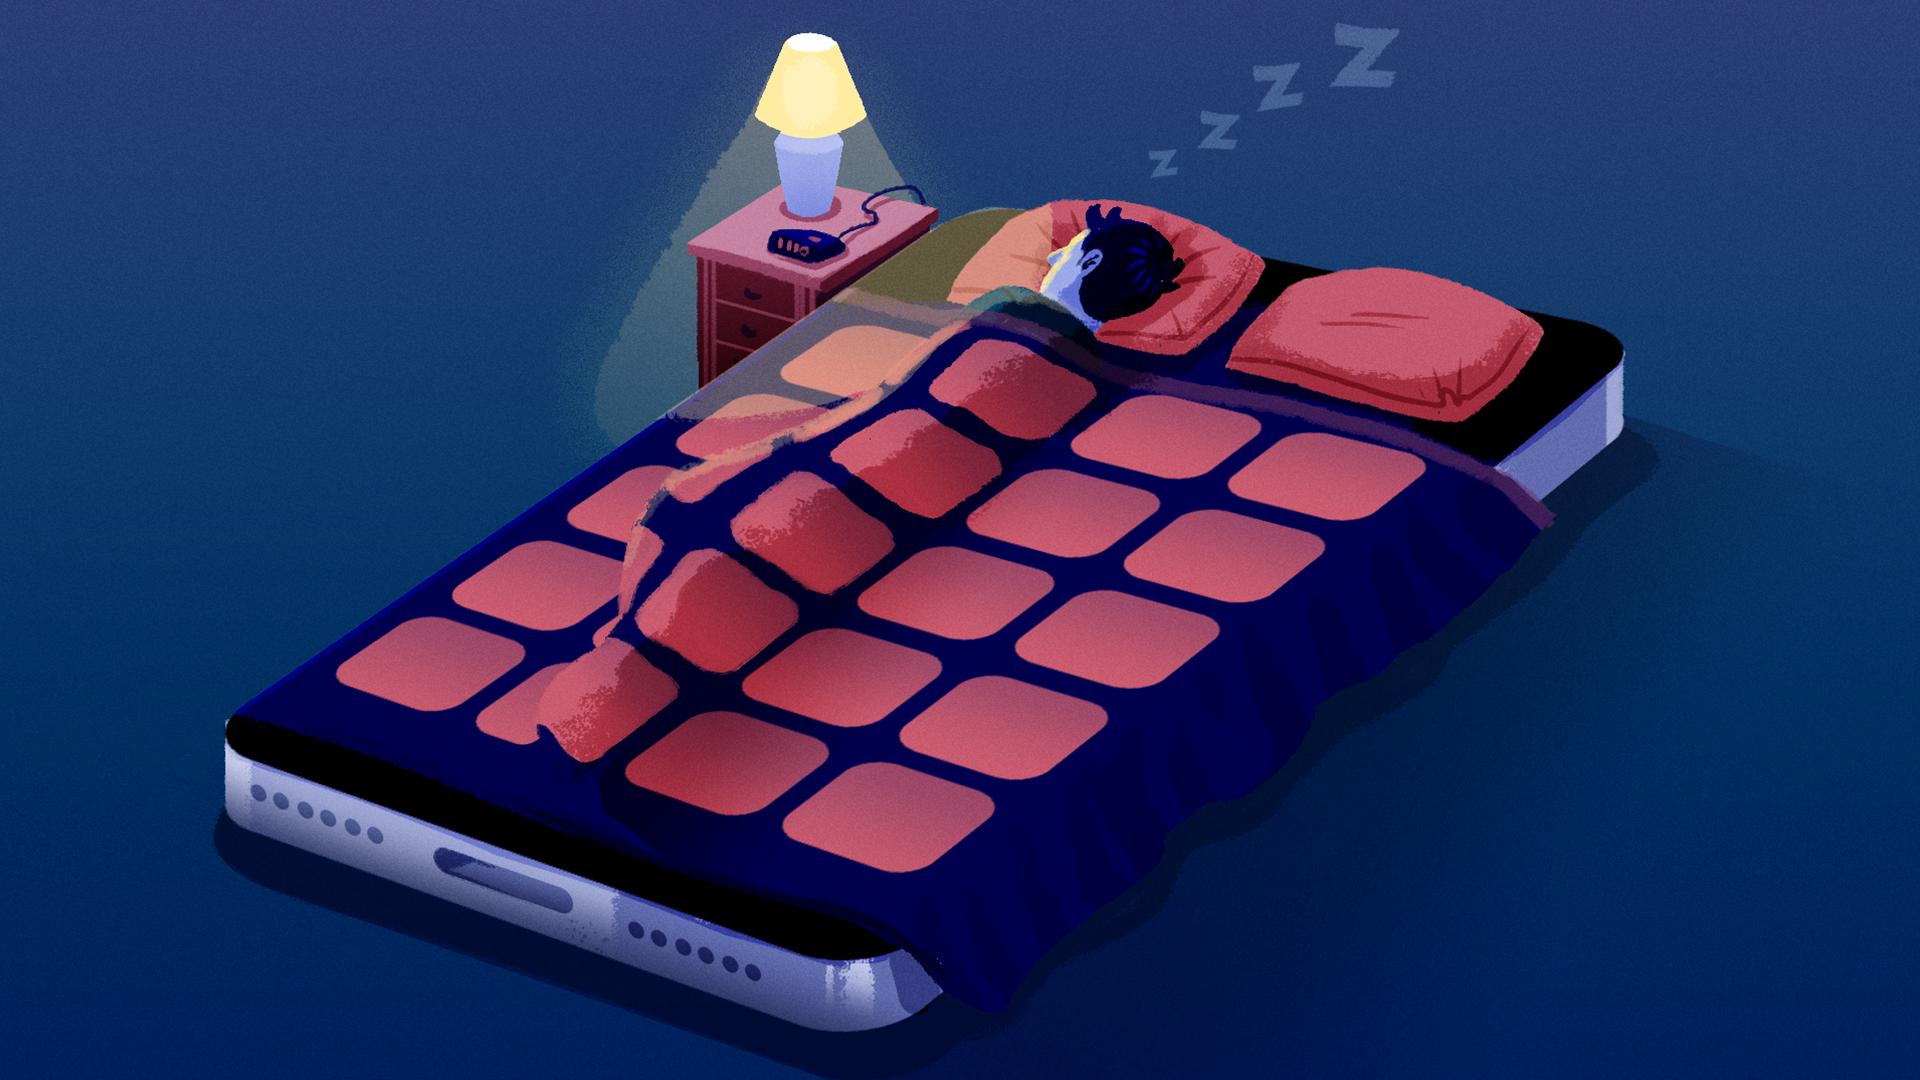 Sleeping-Apps-Thumb-BAG.png